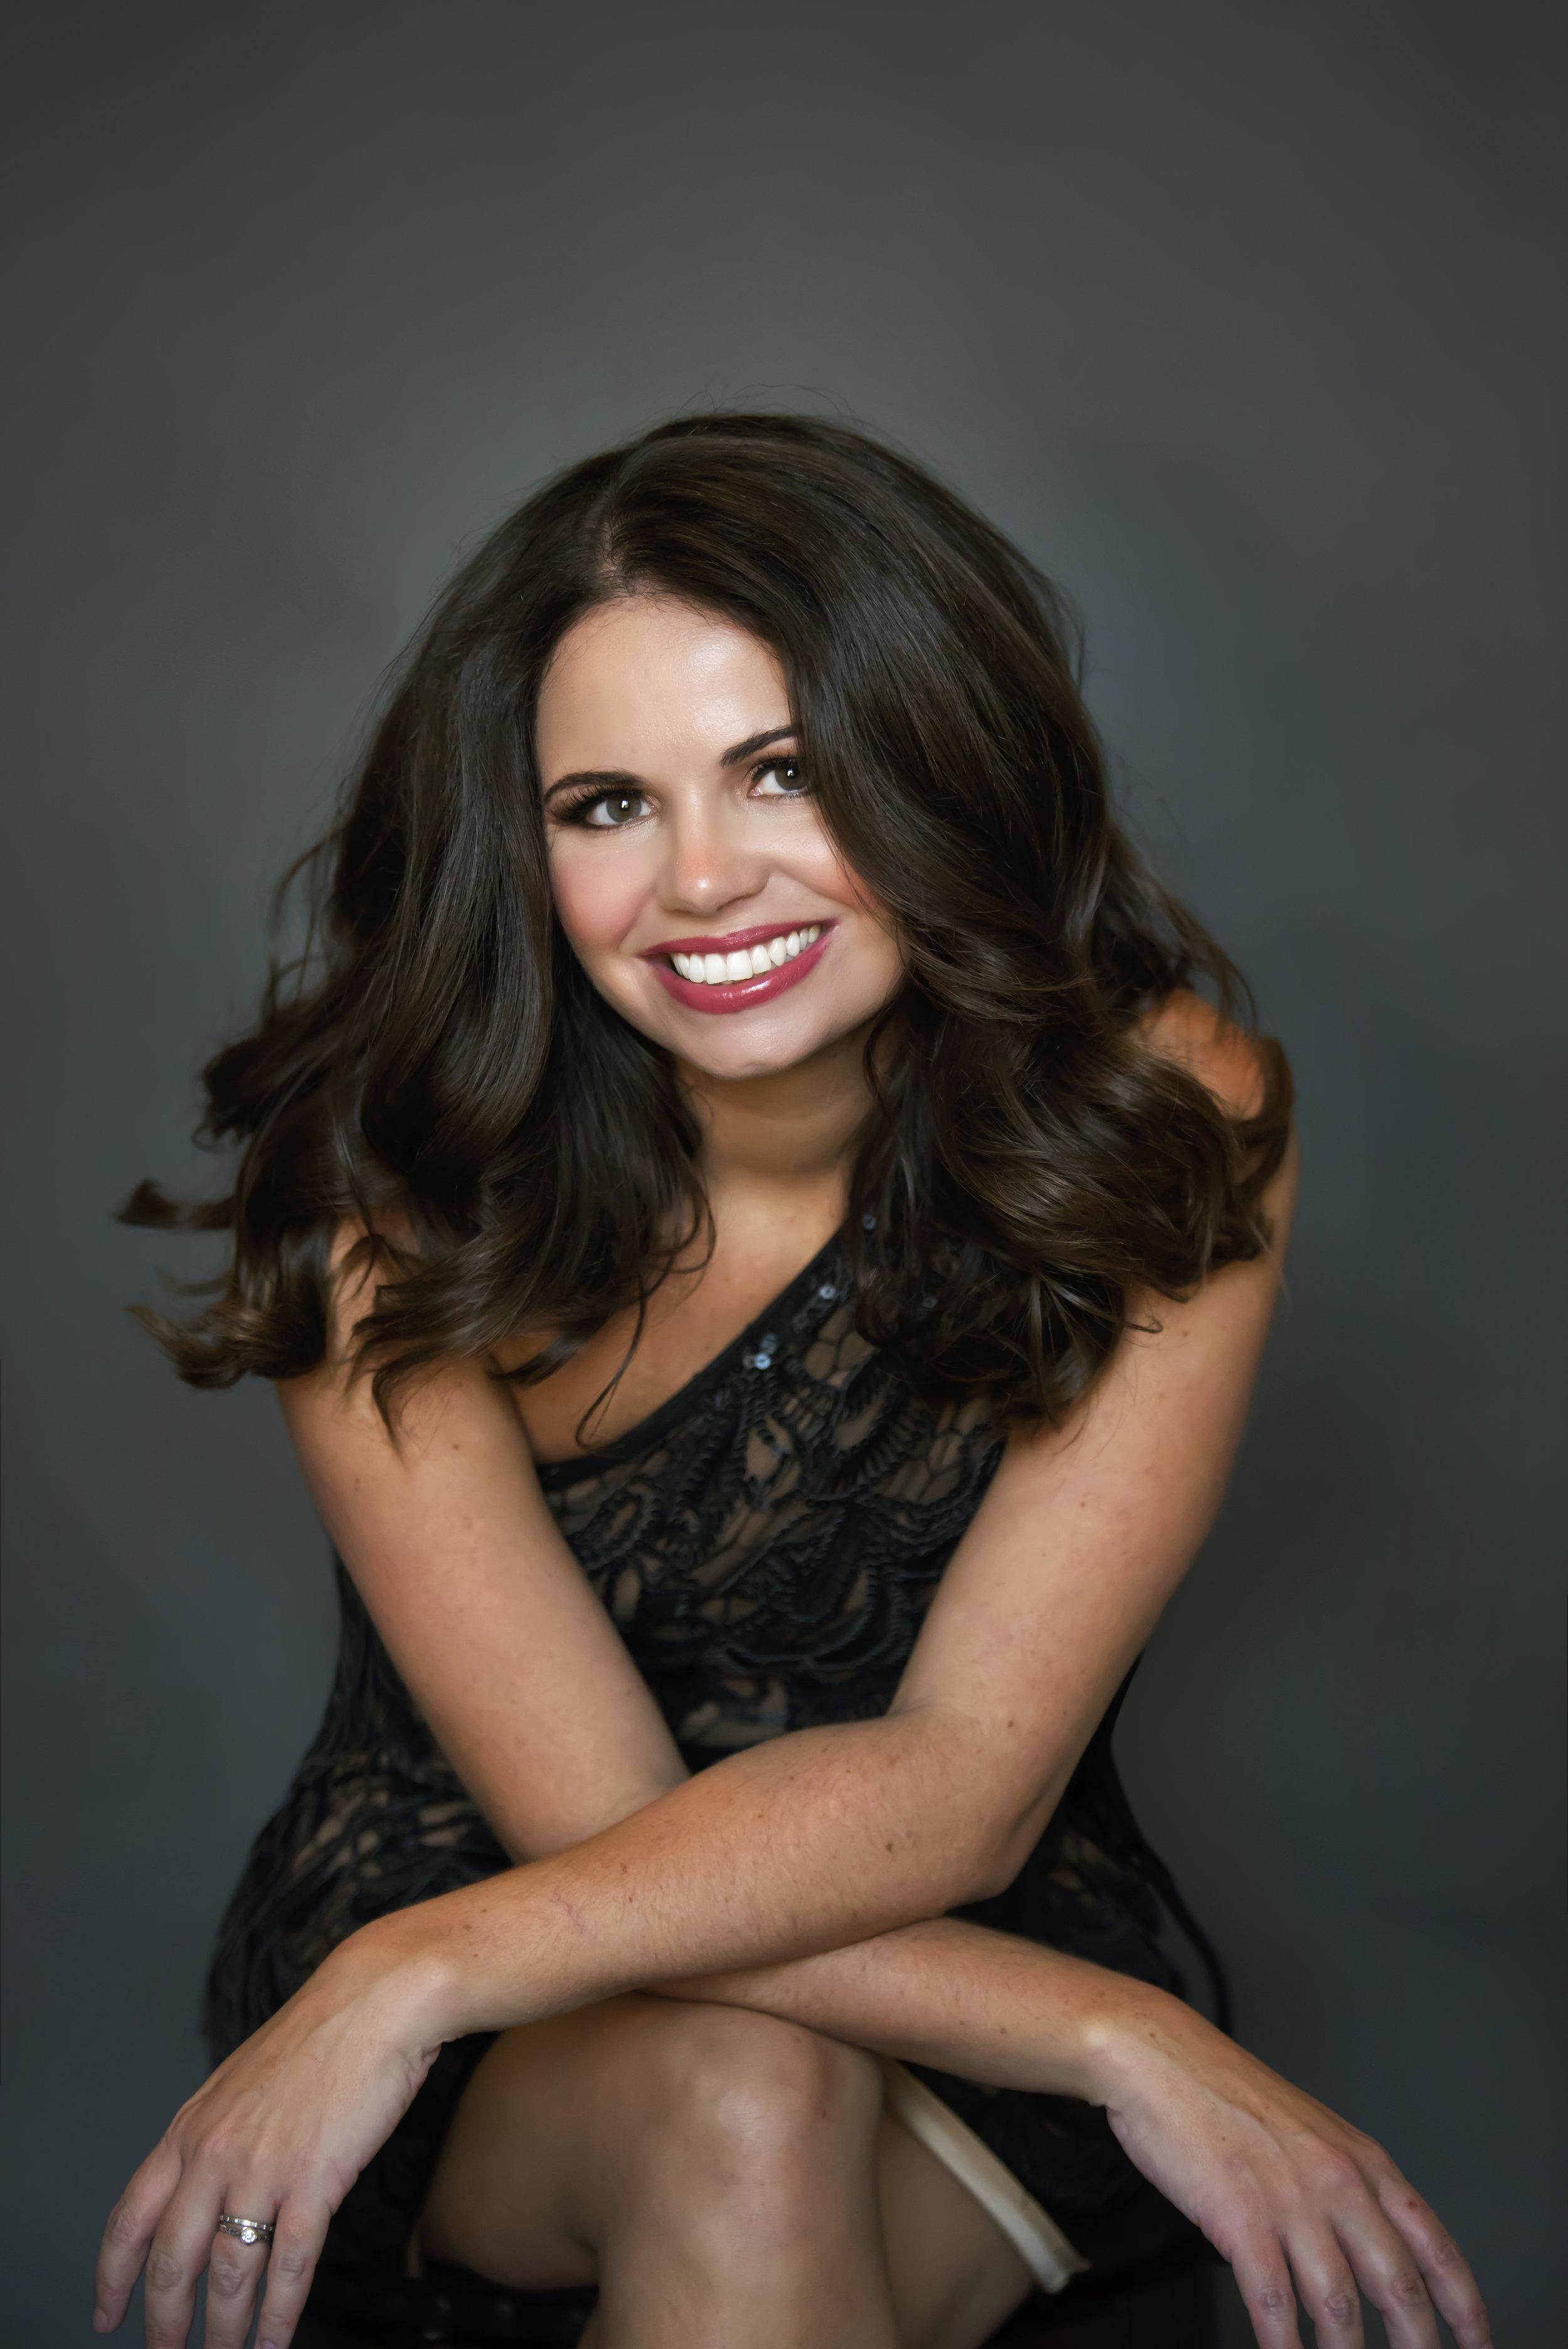 Reina-LeGrand-Photography-Photographer-beauty-glam-glamour-glamor-headshot-boudoir-DFW-Dallas-Fort-Worth-Southlake-Colleyville-Grapevine-Roanoke-Keller-Westlake-Portrait-Photo-Session-k-argyle.jpg